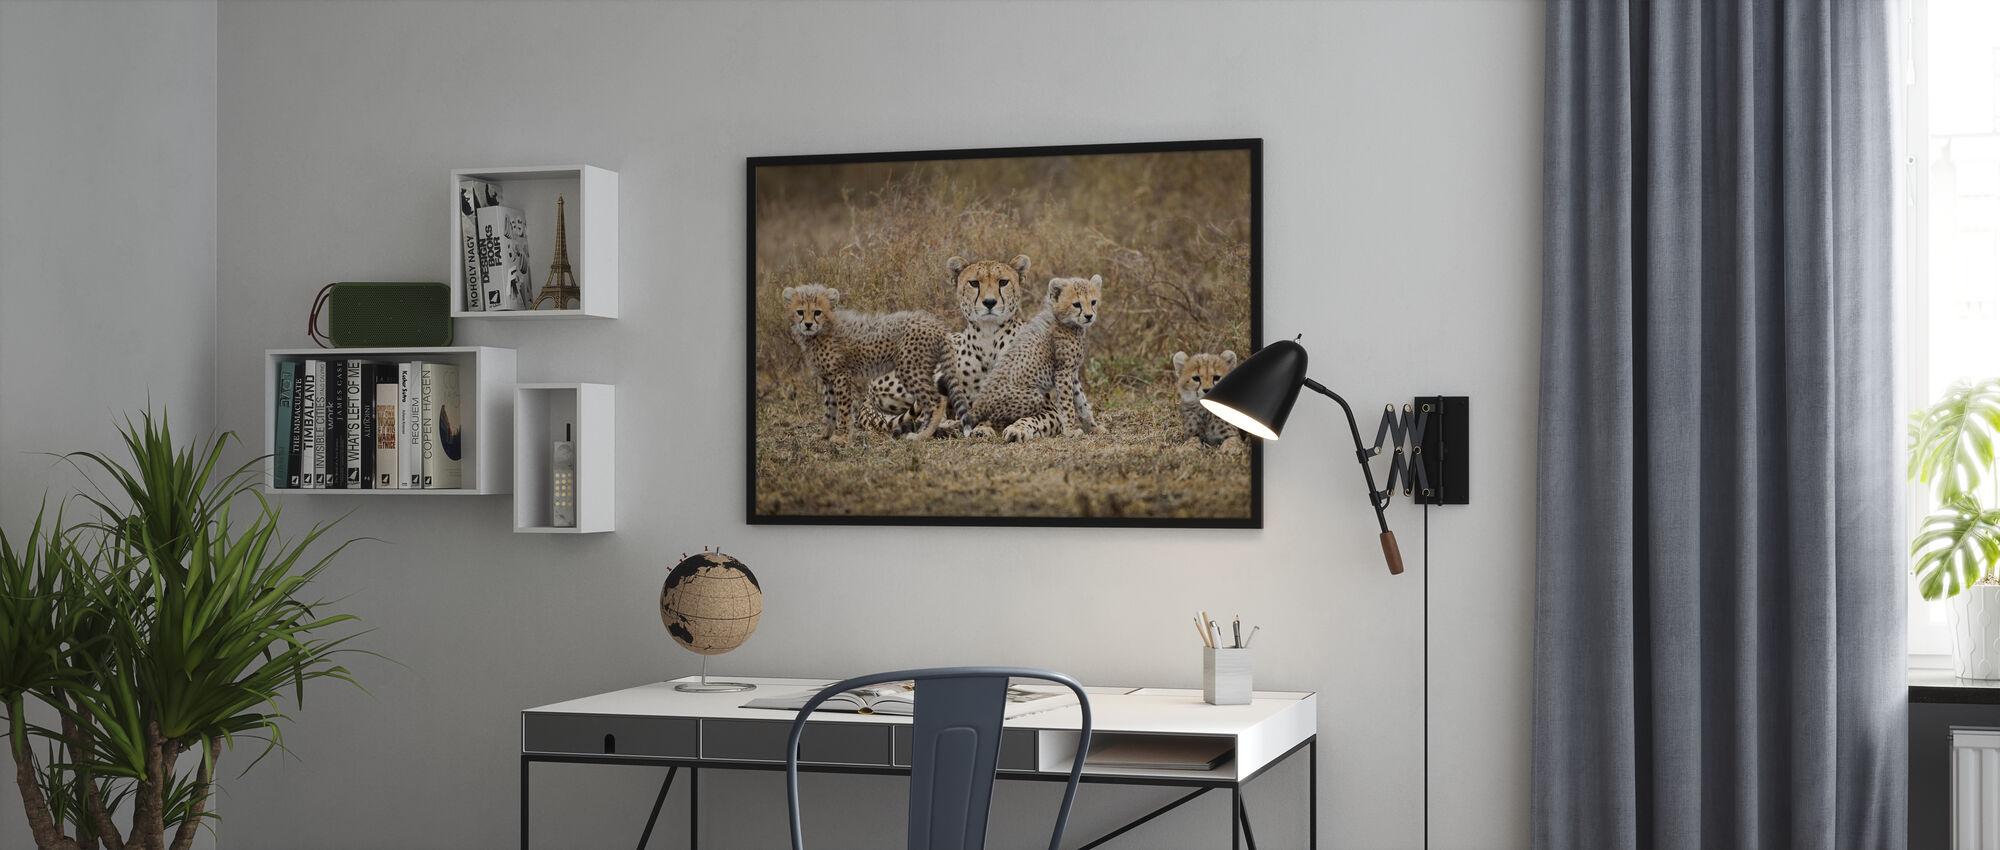 Cheetah Cubs och mor - Poster - Kontor